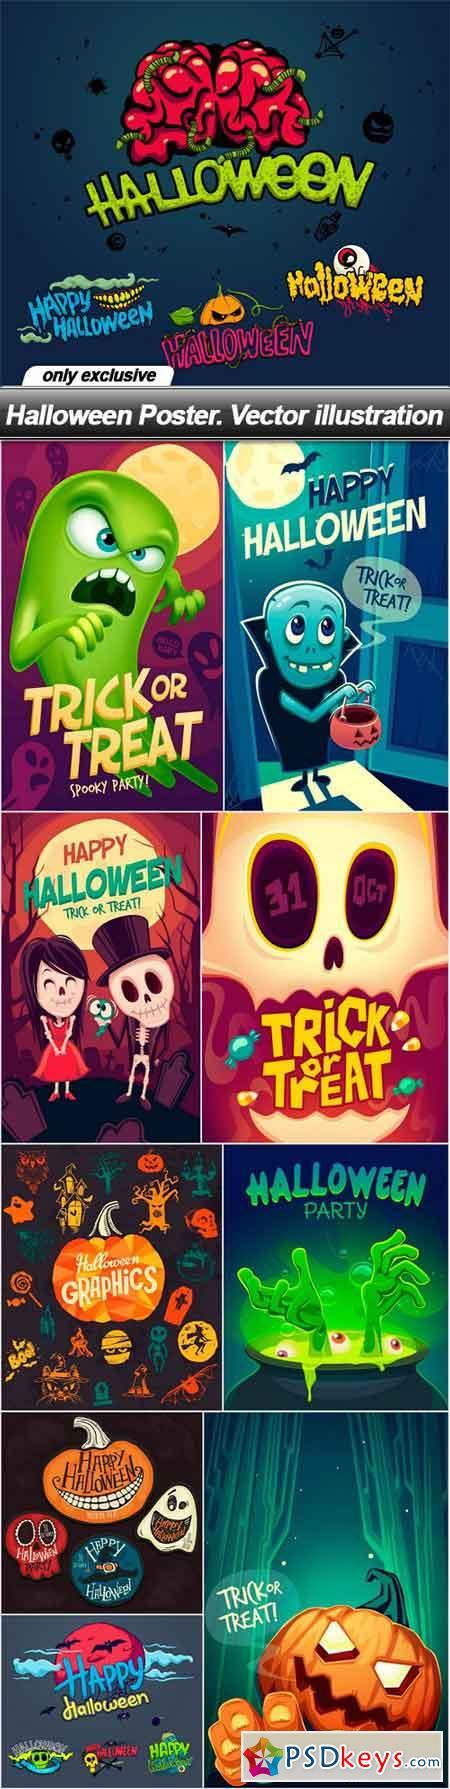 Halloween Poster. Vector illustration - 10 EPS